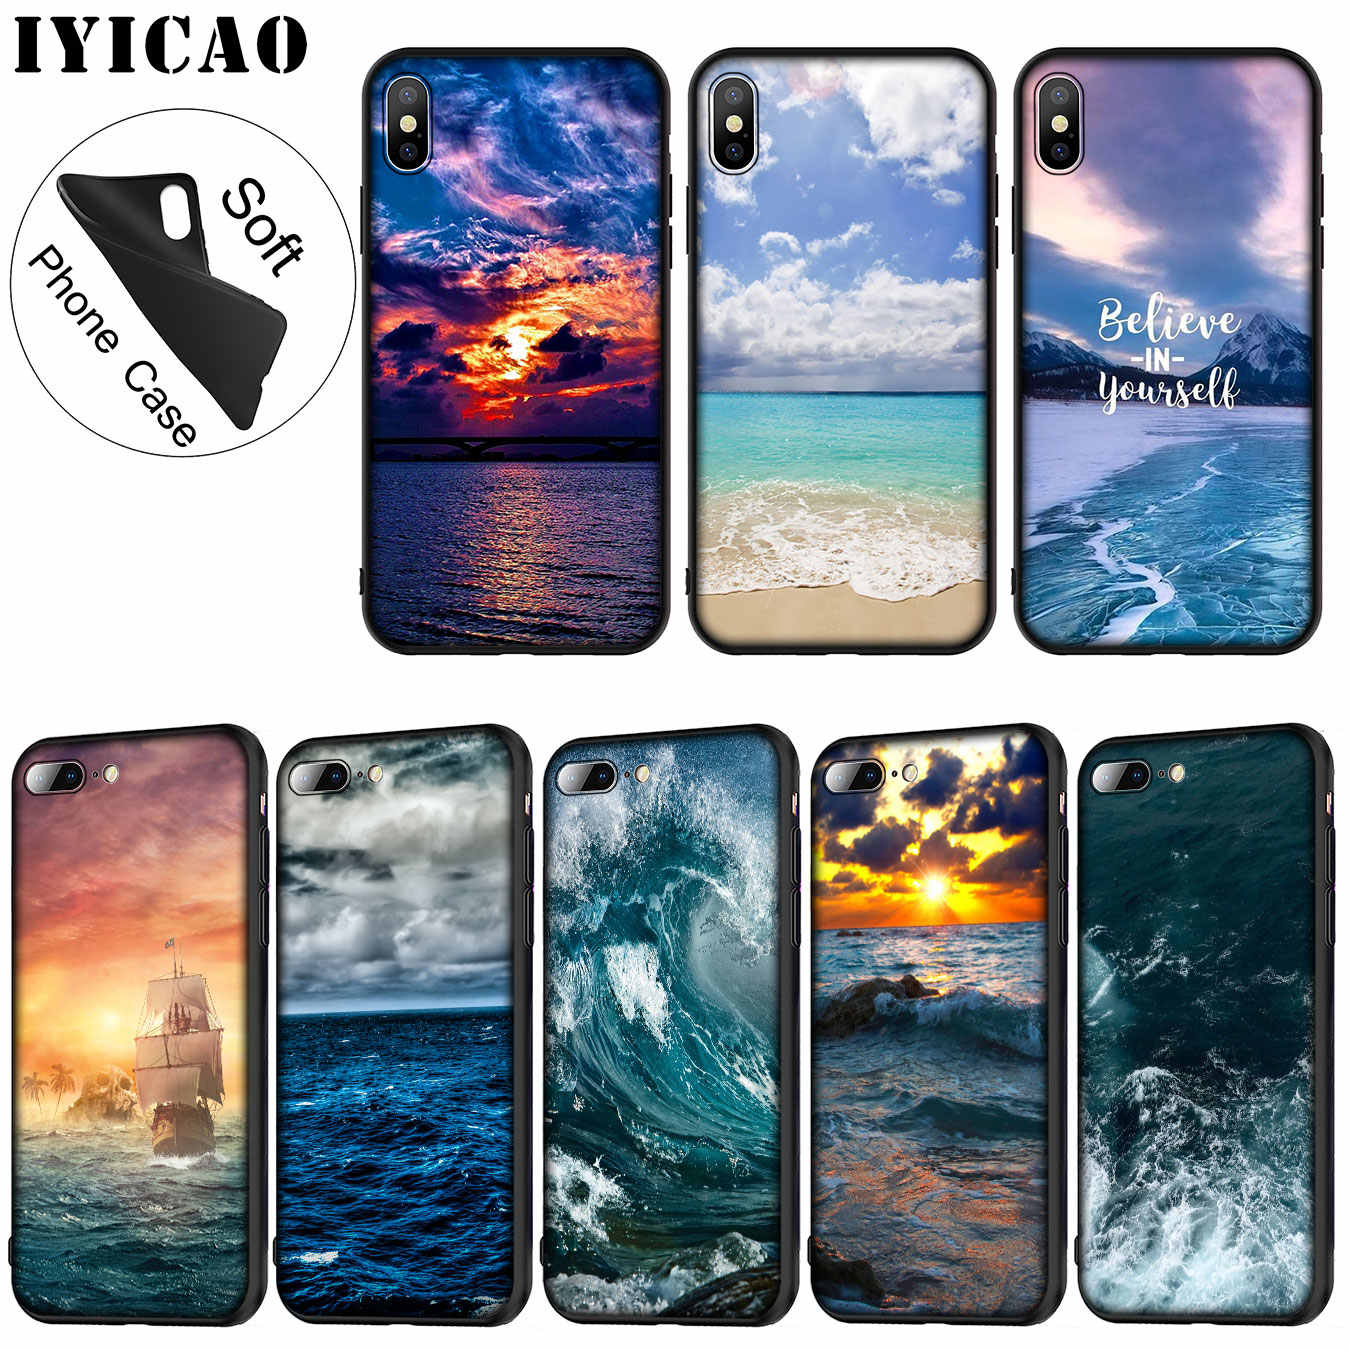 Sea Spray iPhone 11 case